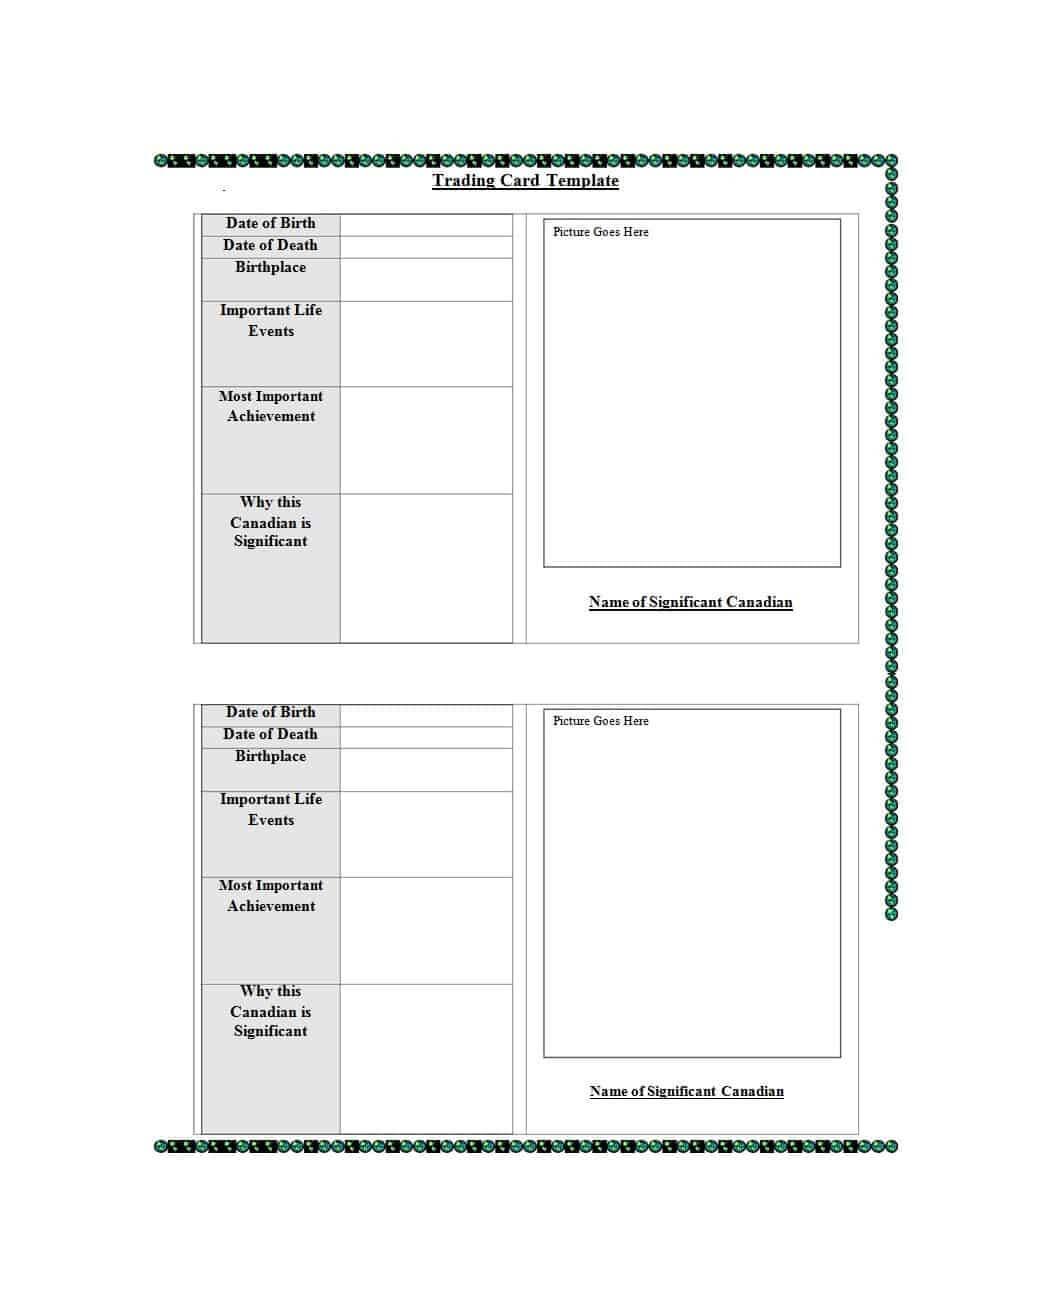 33 Free Trading Card Templates (Baseball, Football, Etc In Trading Card Template Word